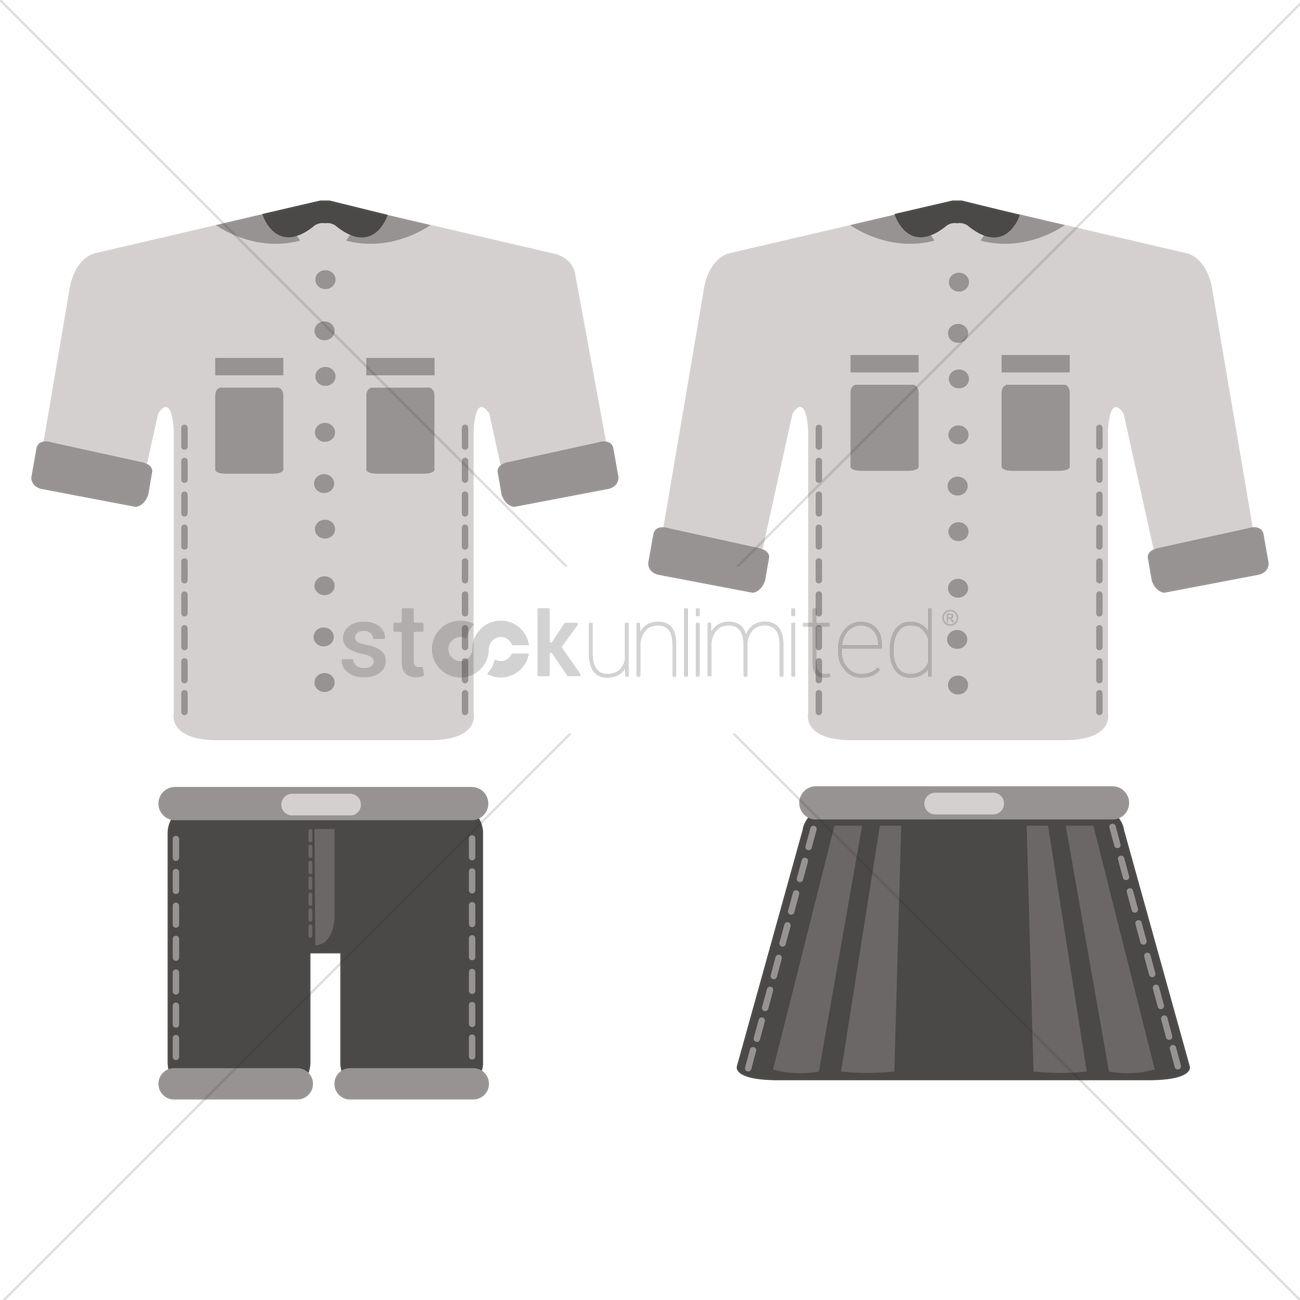 1300x1300 School Uniform Vector Image